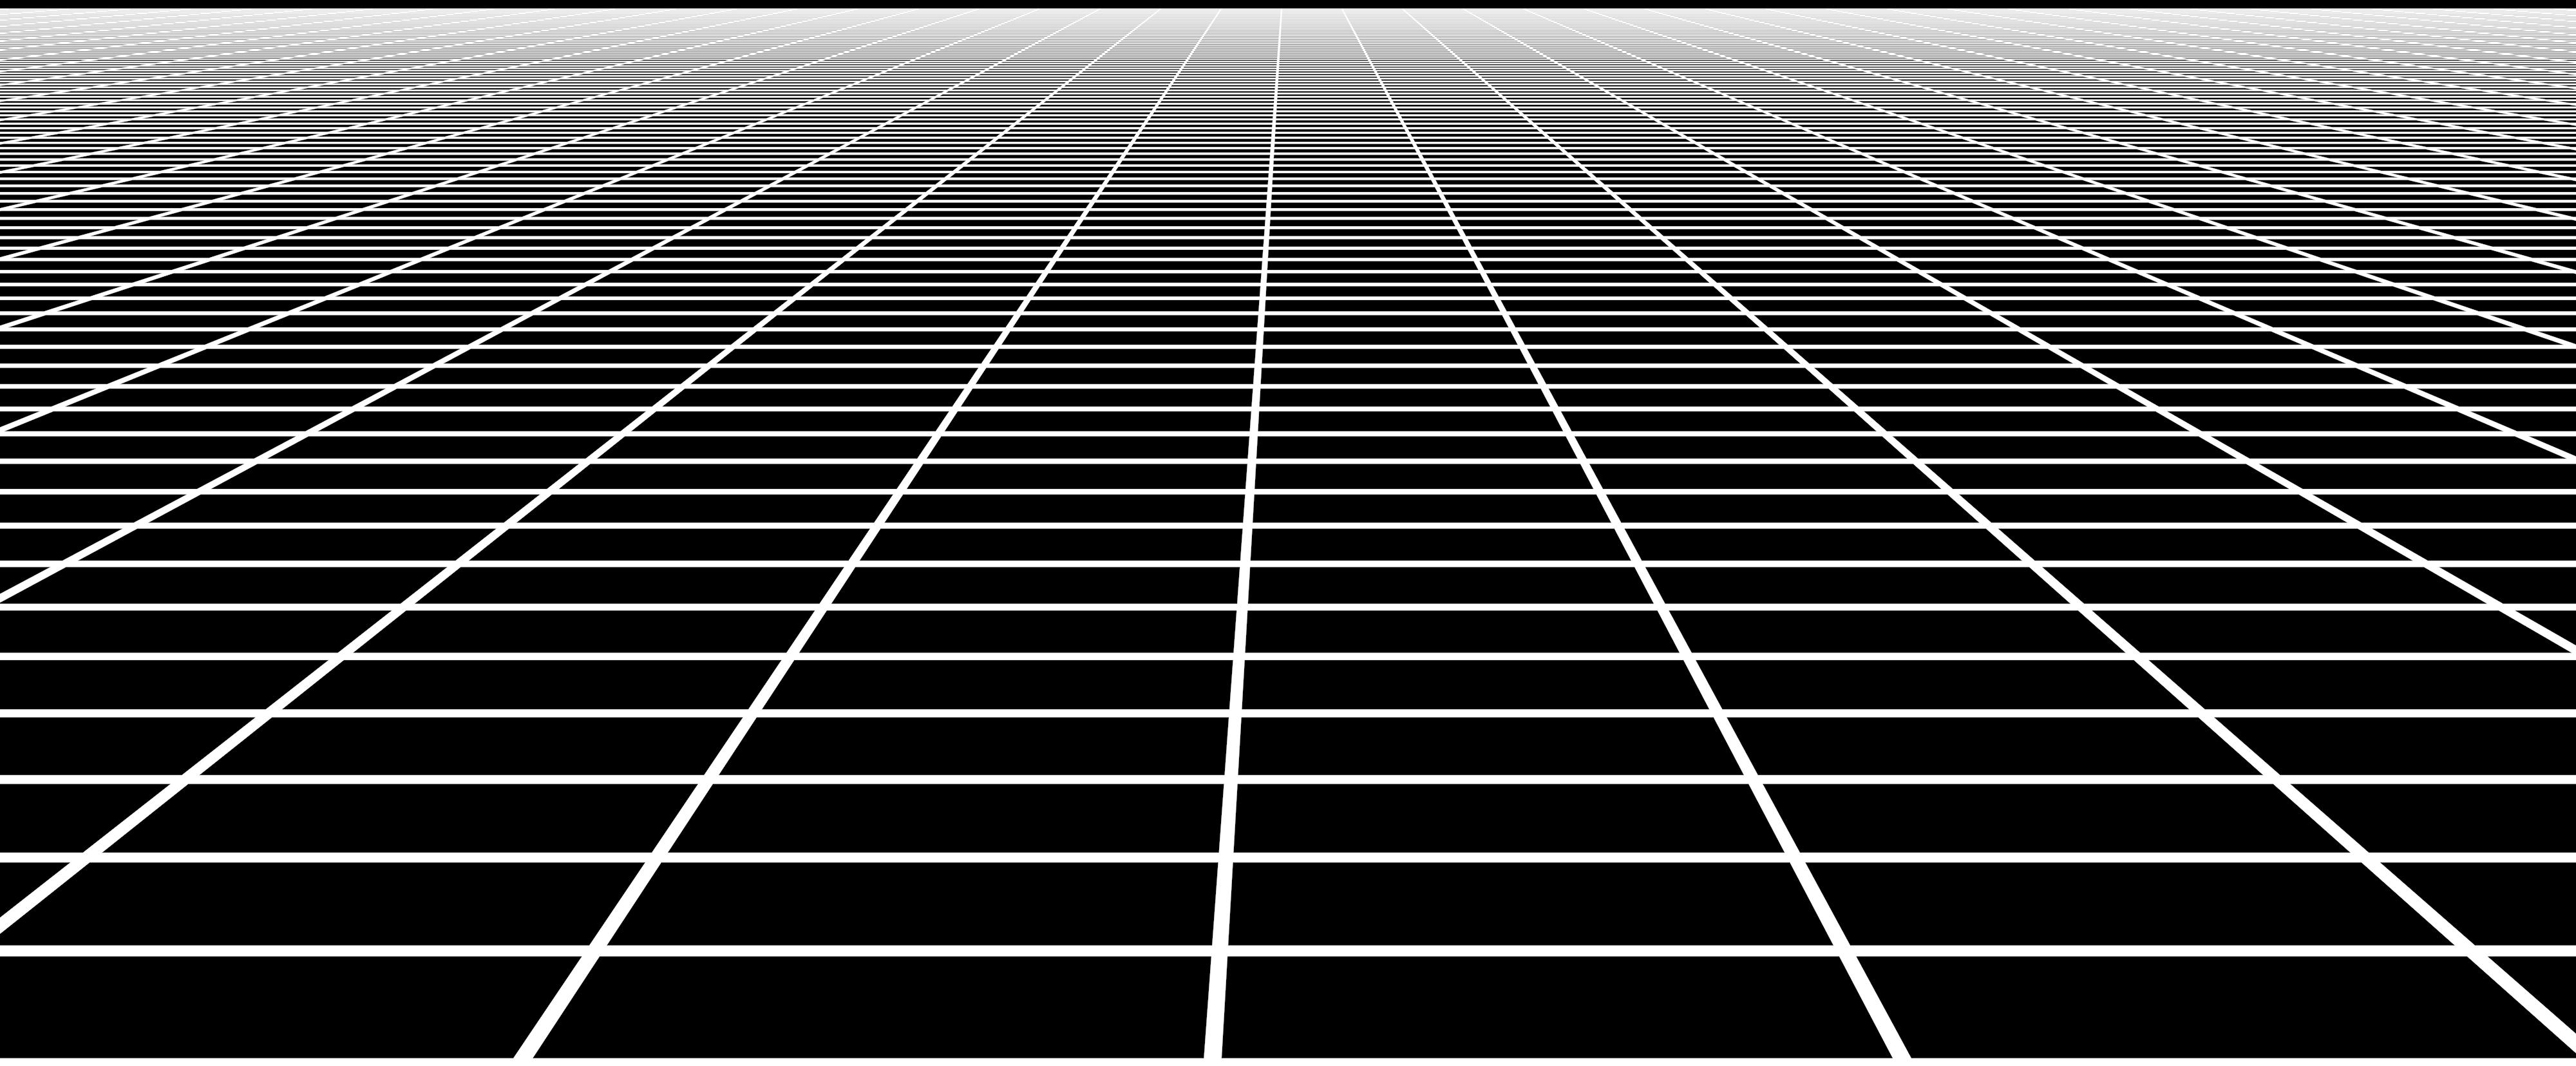 Lava social audio grid